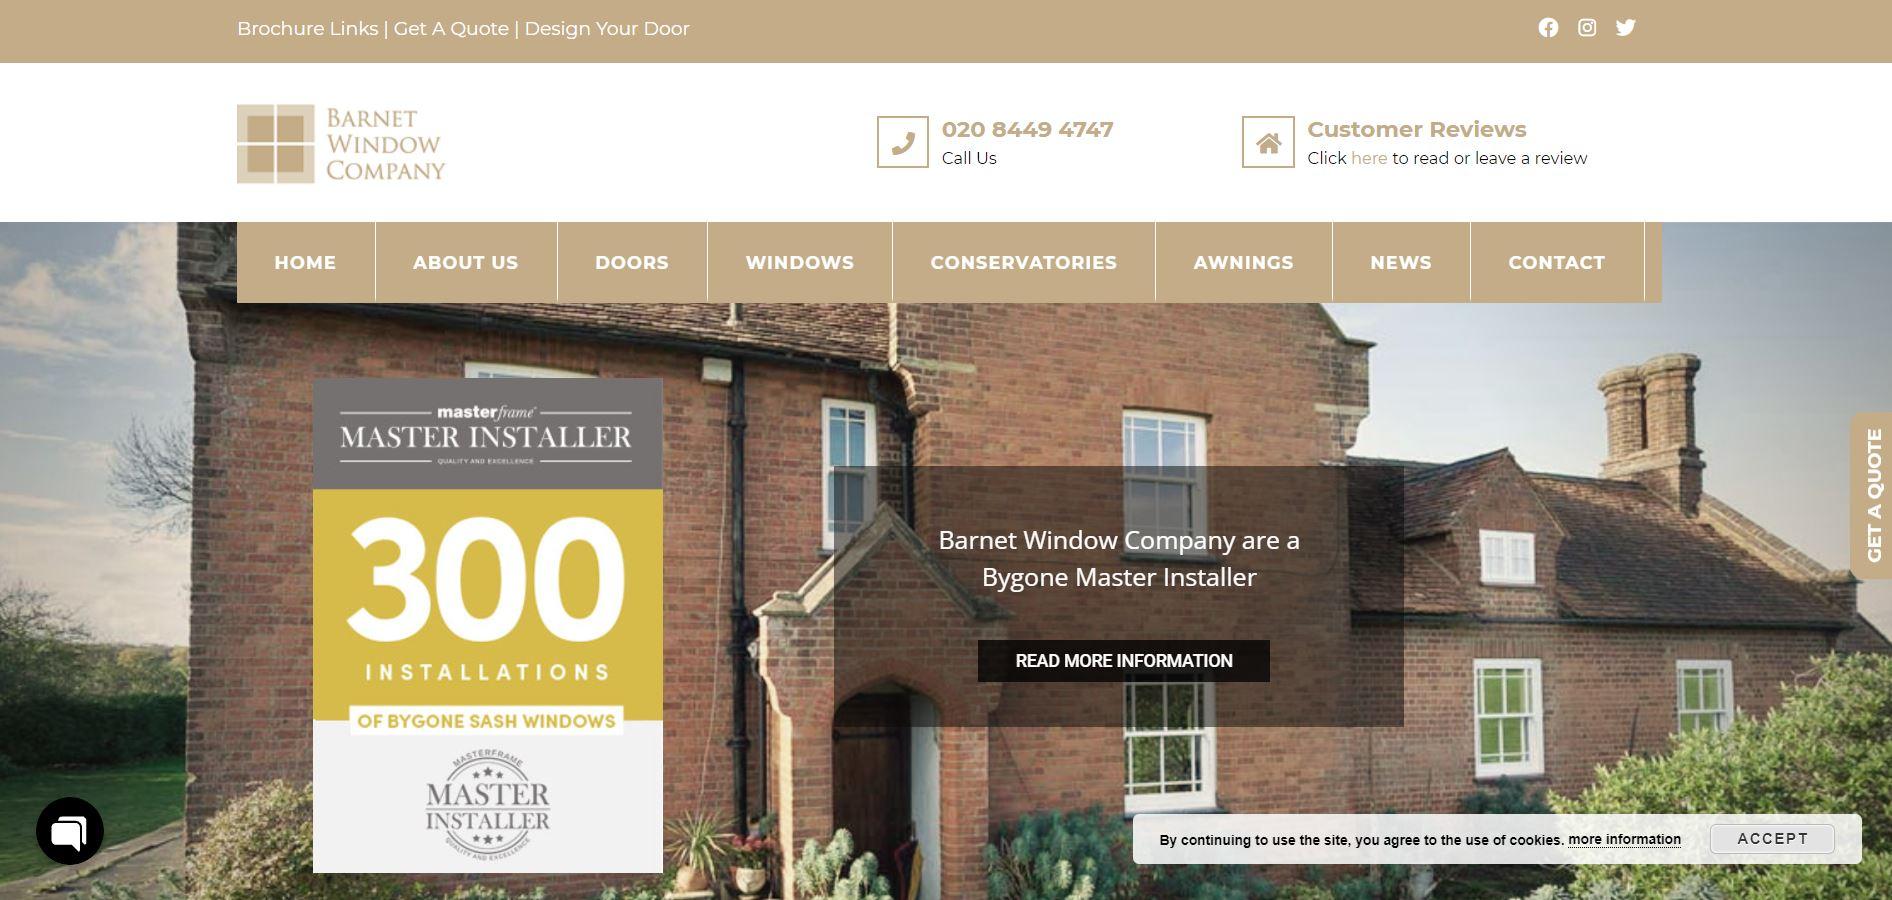 Barnet Window Company